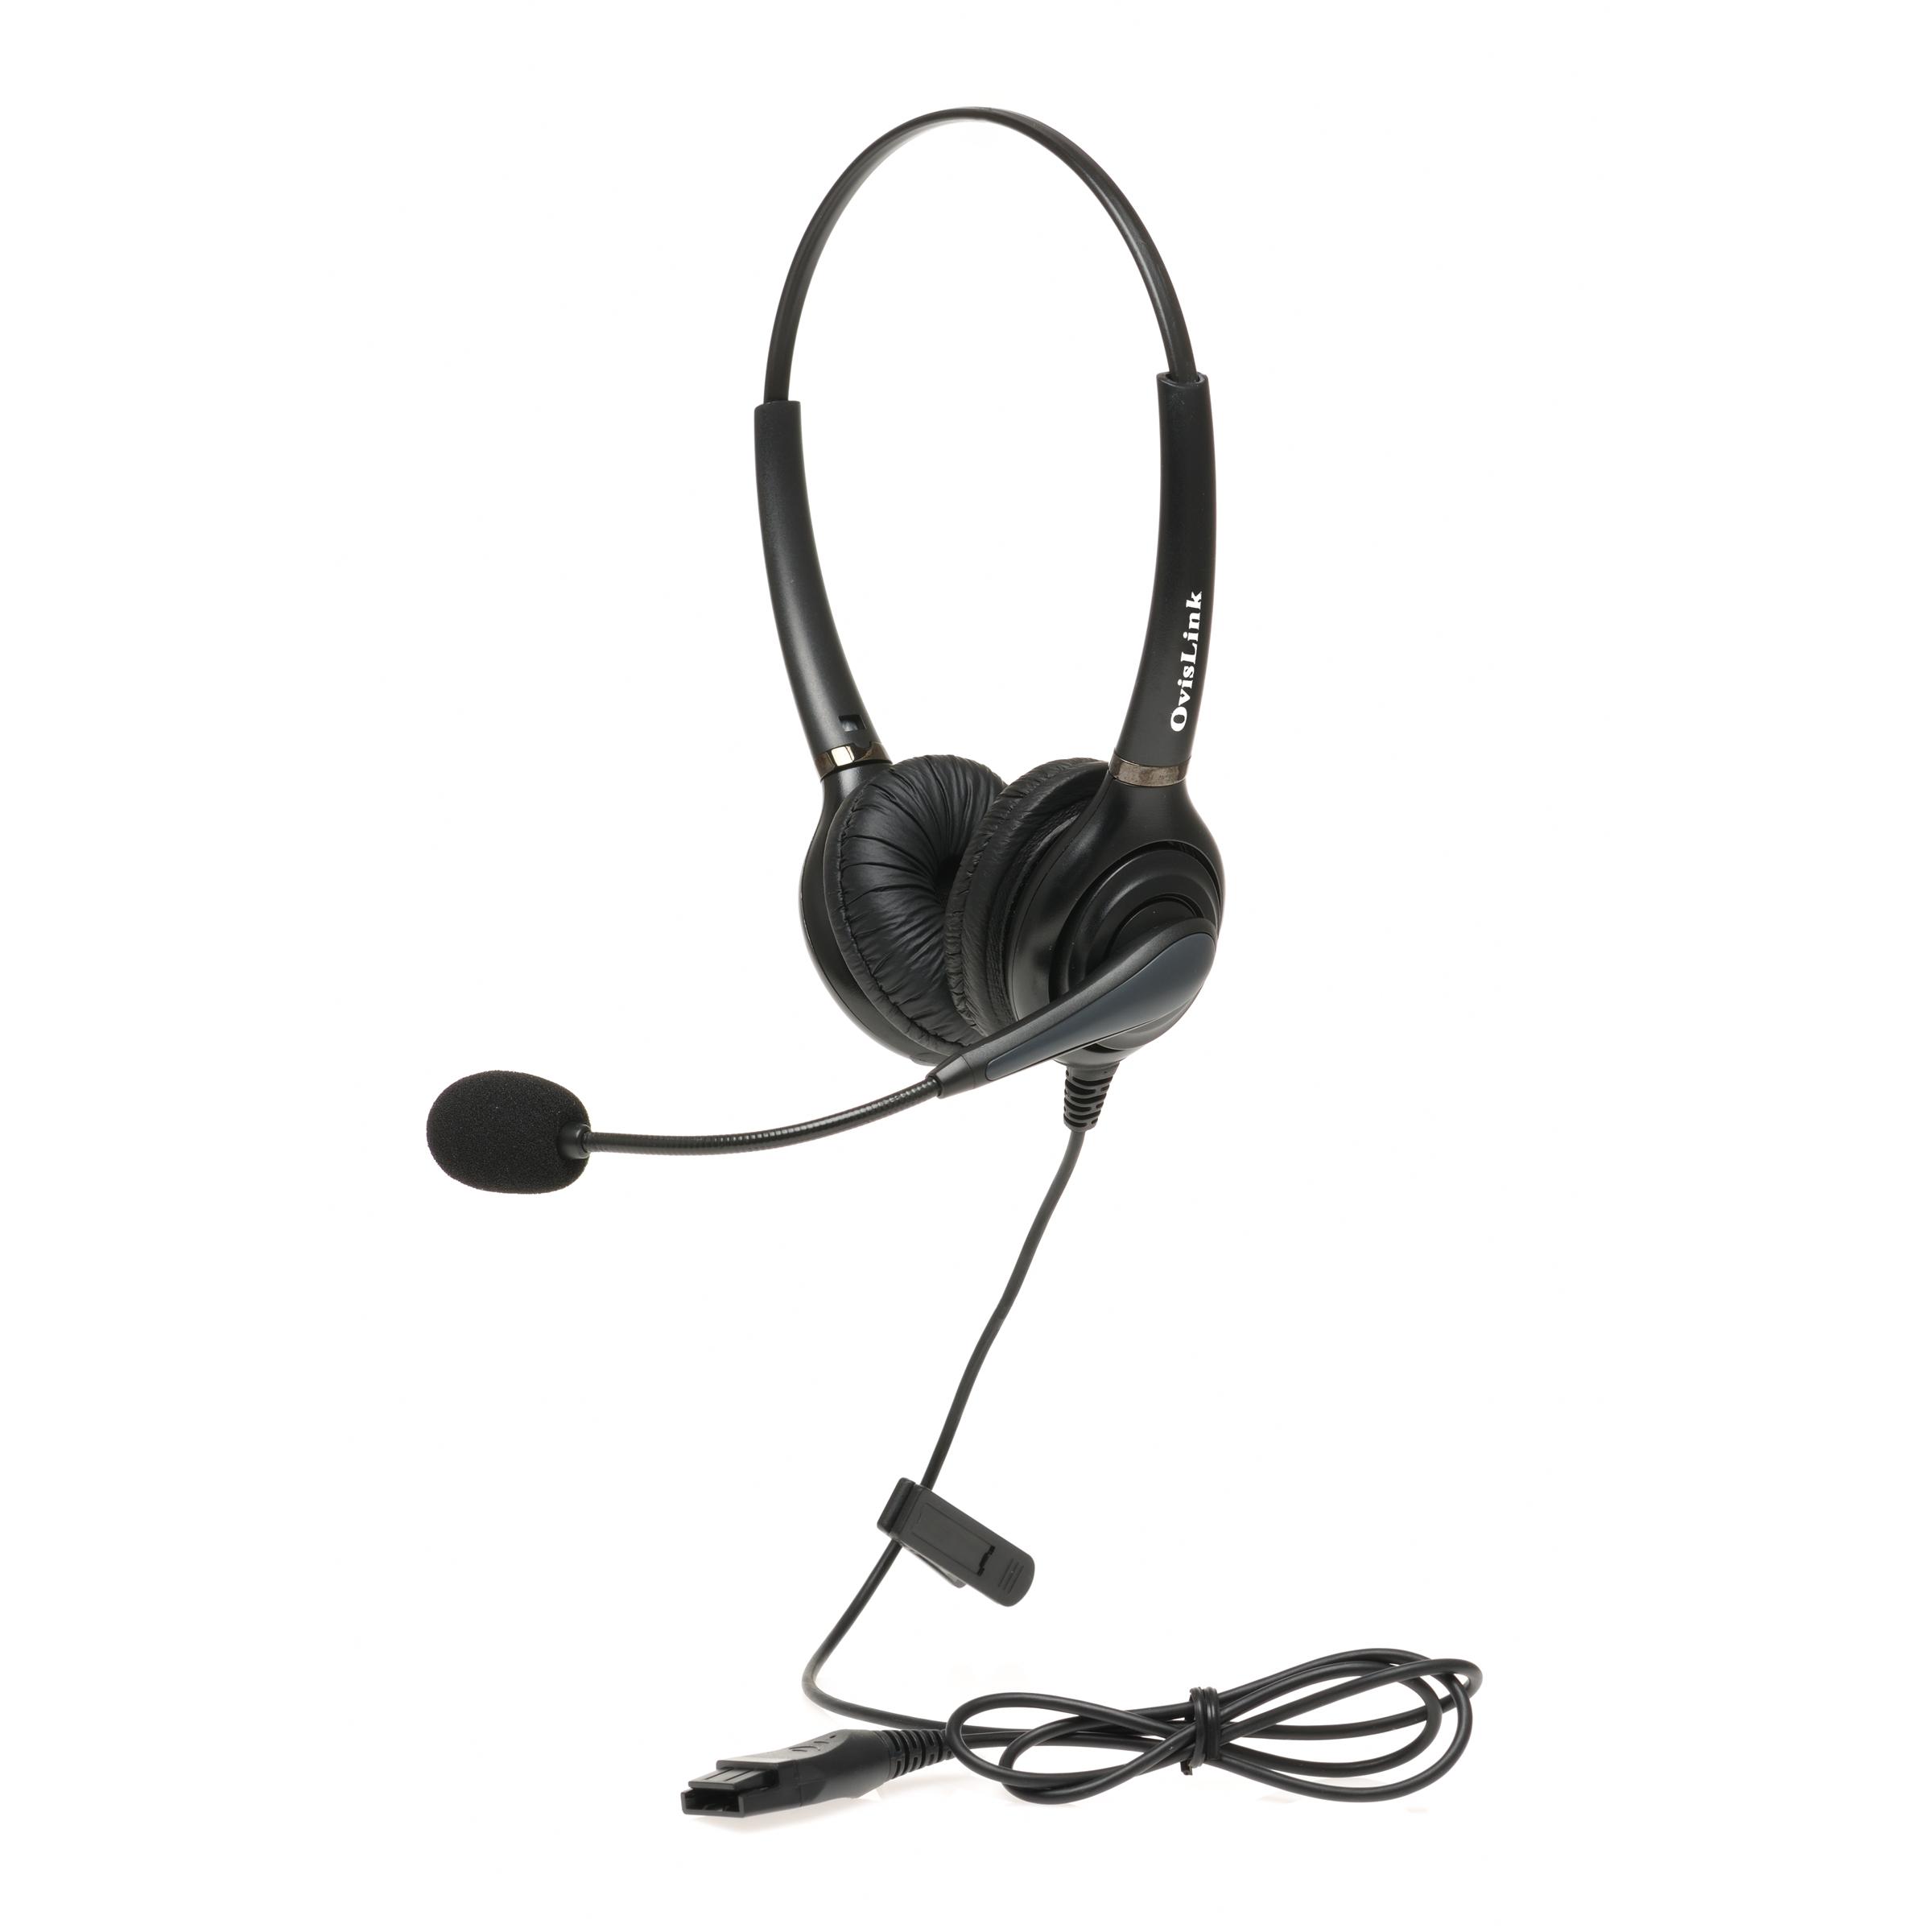 Cisco Unified IP Phone Headset, Dual Ear